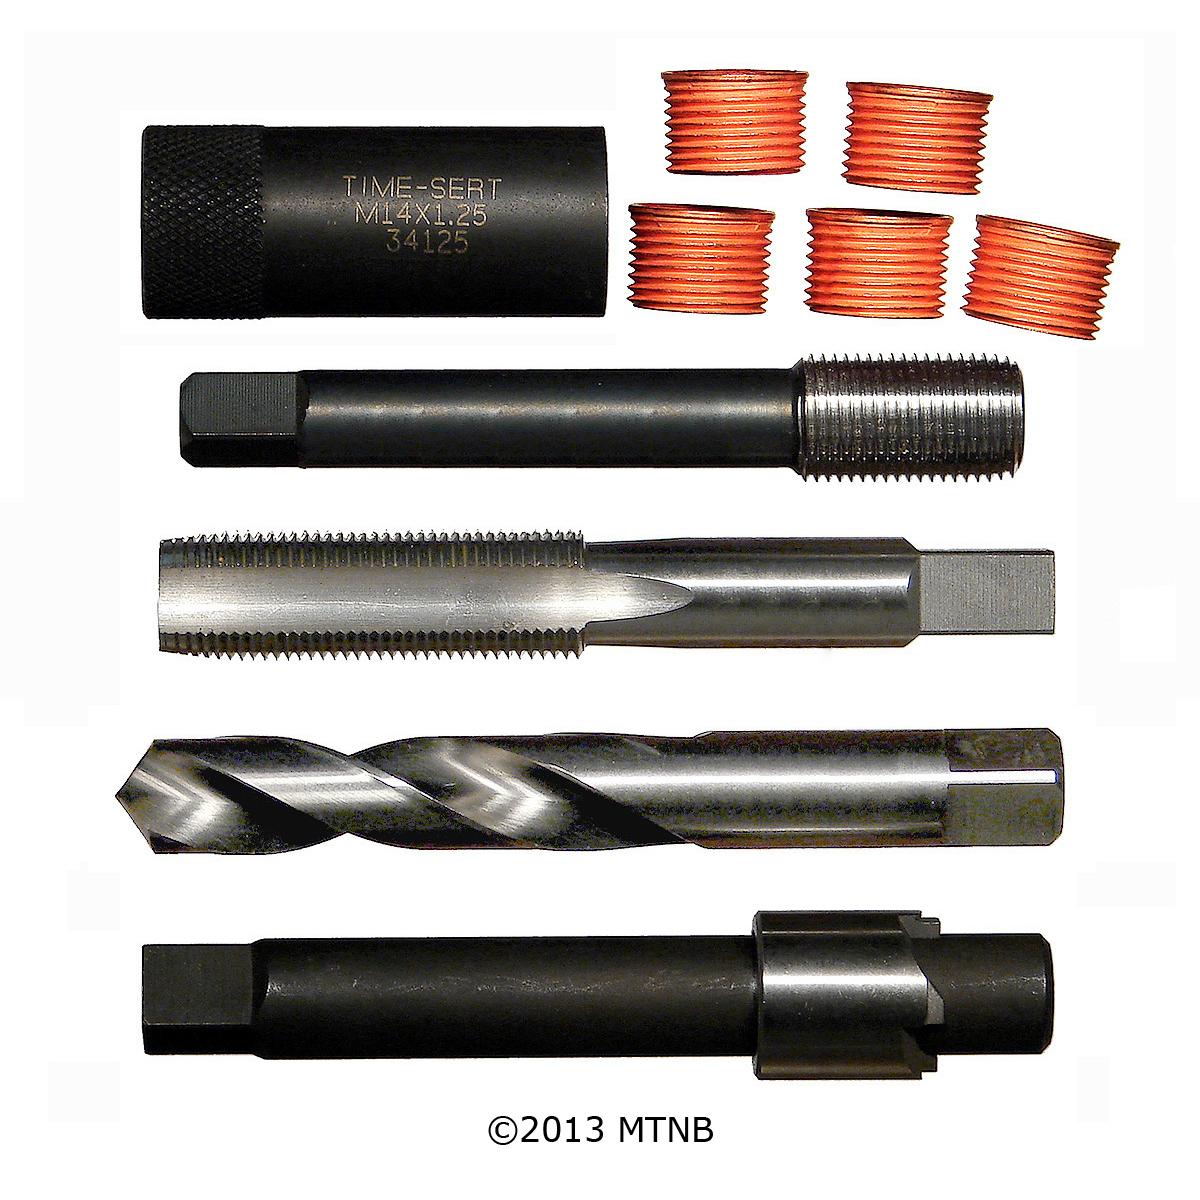 10 Pack Time-Sert 44127 M14 x 1.25 x 11 Spark Plug Inserts